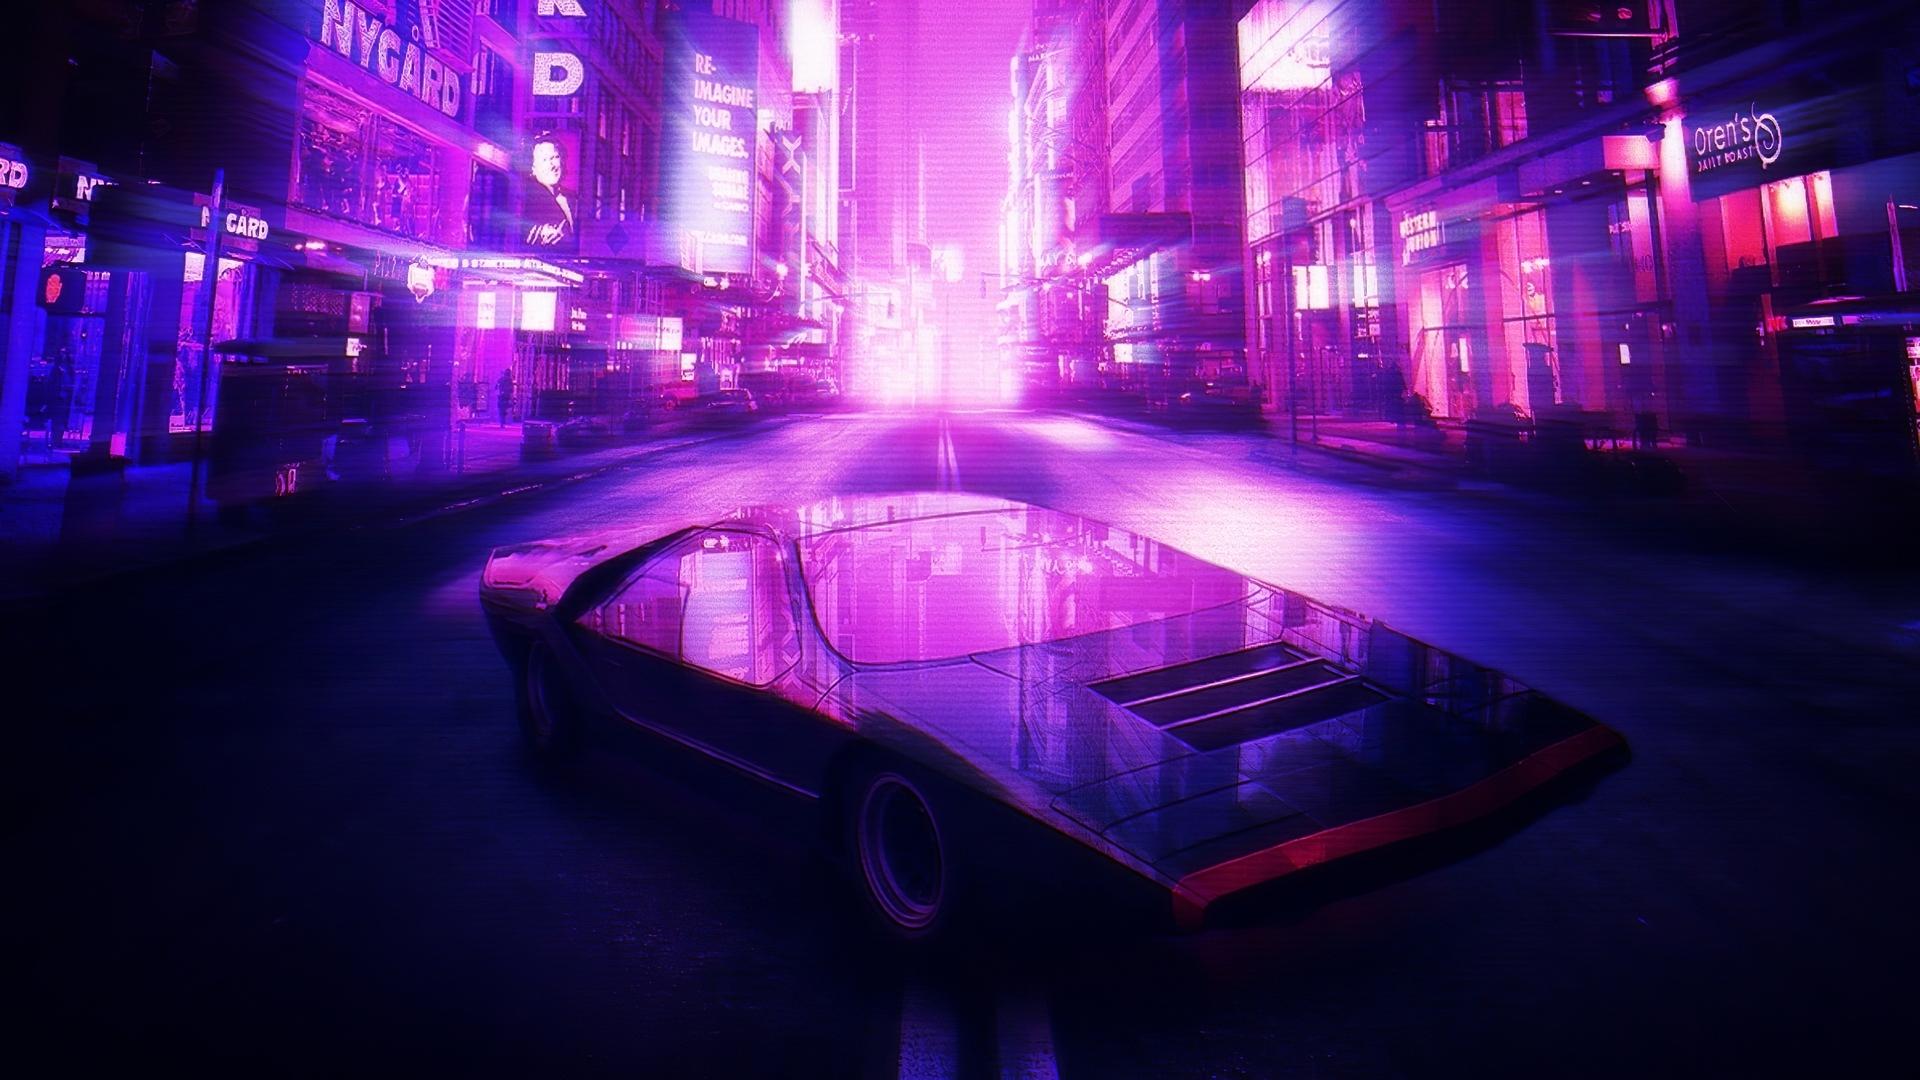 1920x1080 Neon City Car 4k Laptop Full HD 1080P HD 4k ...